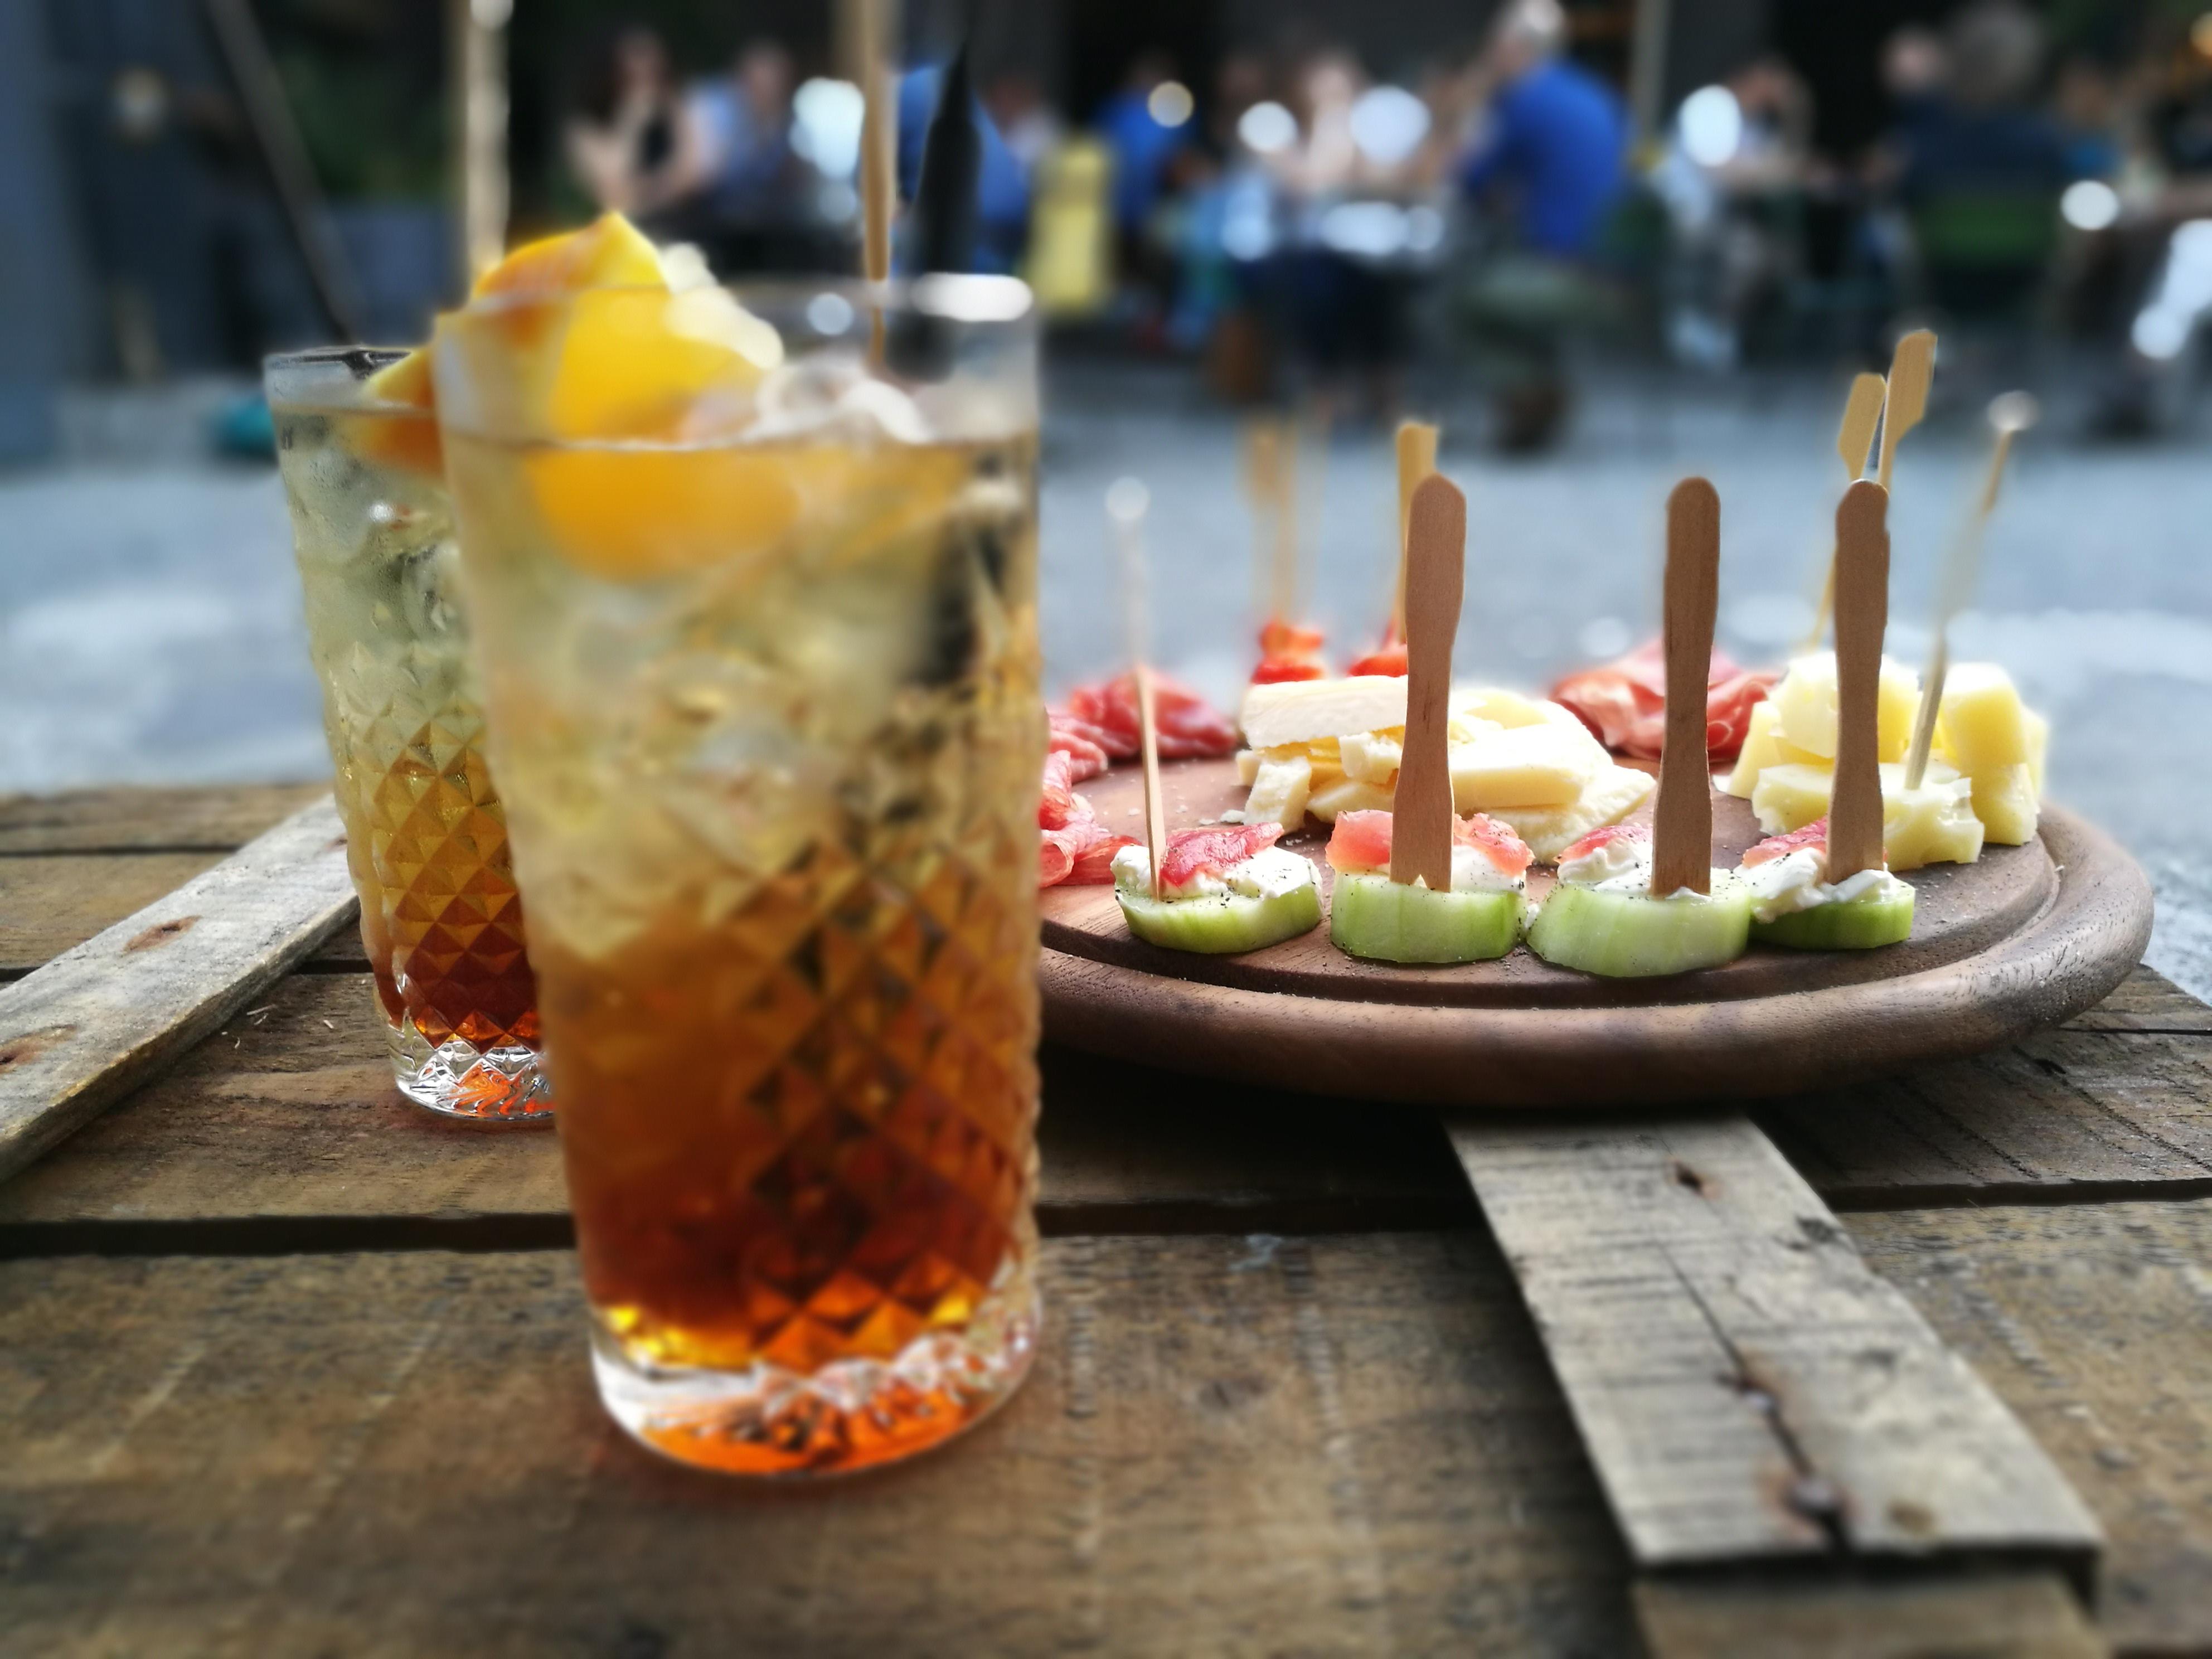 L'Officina Cocktail Bar crea cocktail su misura